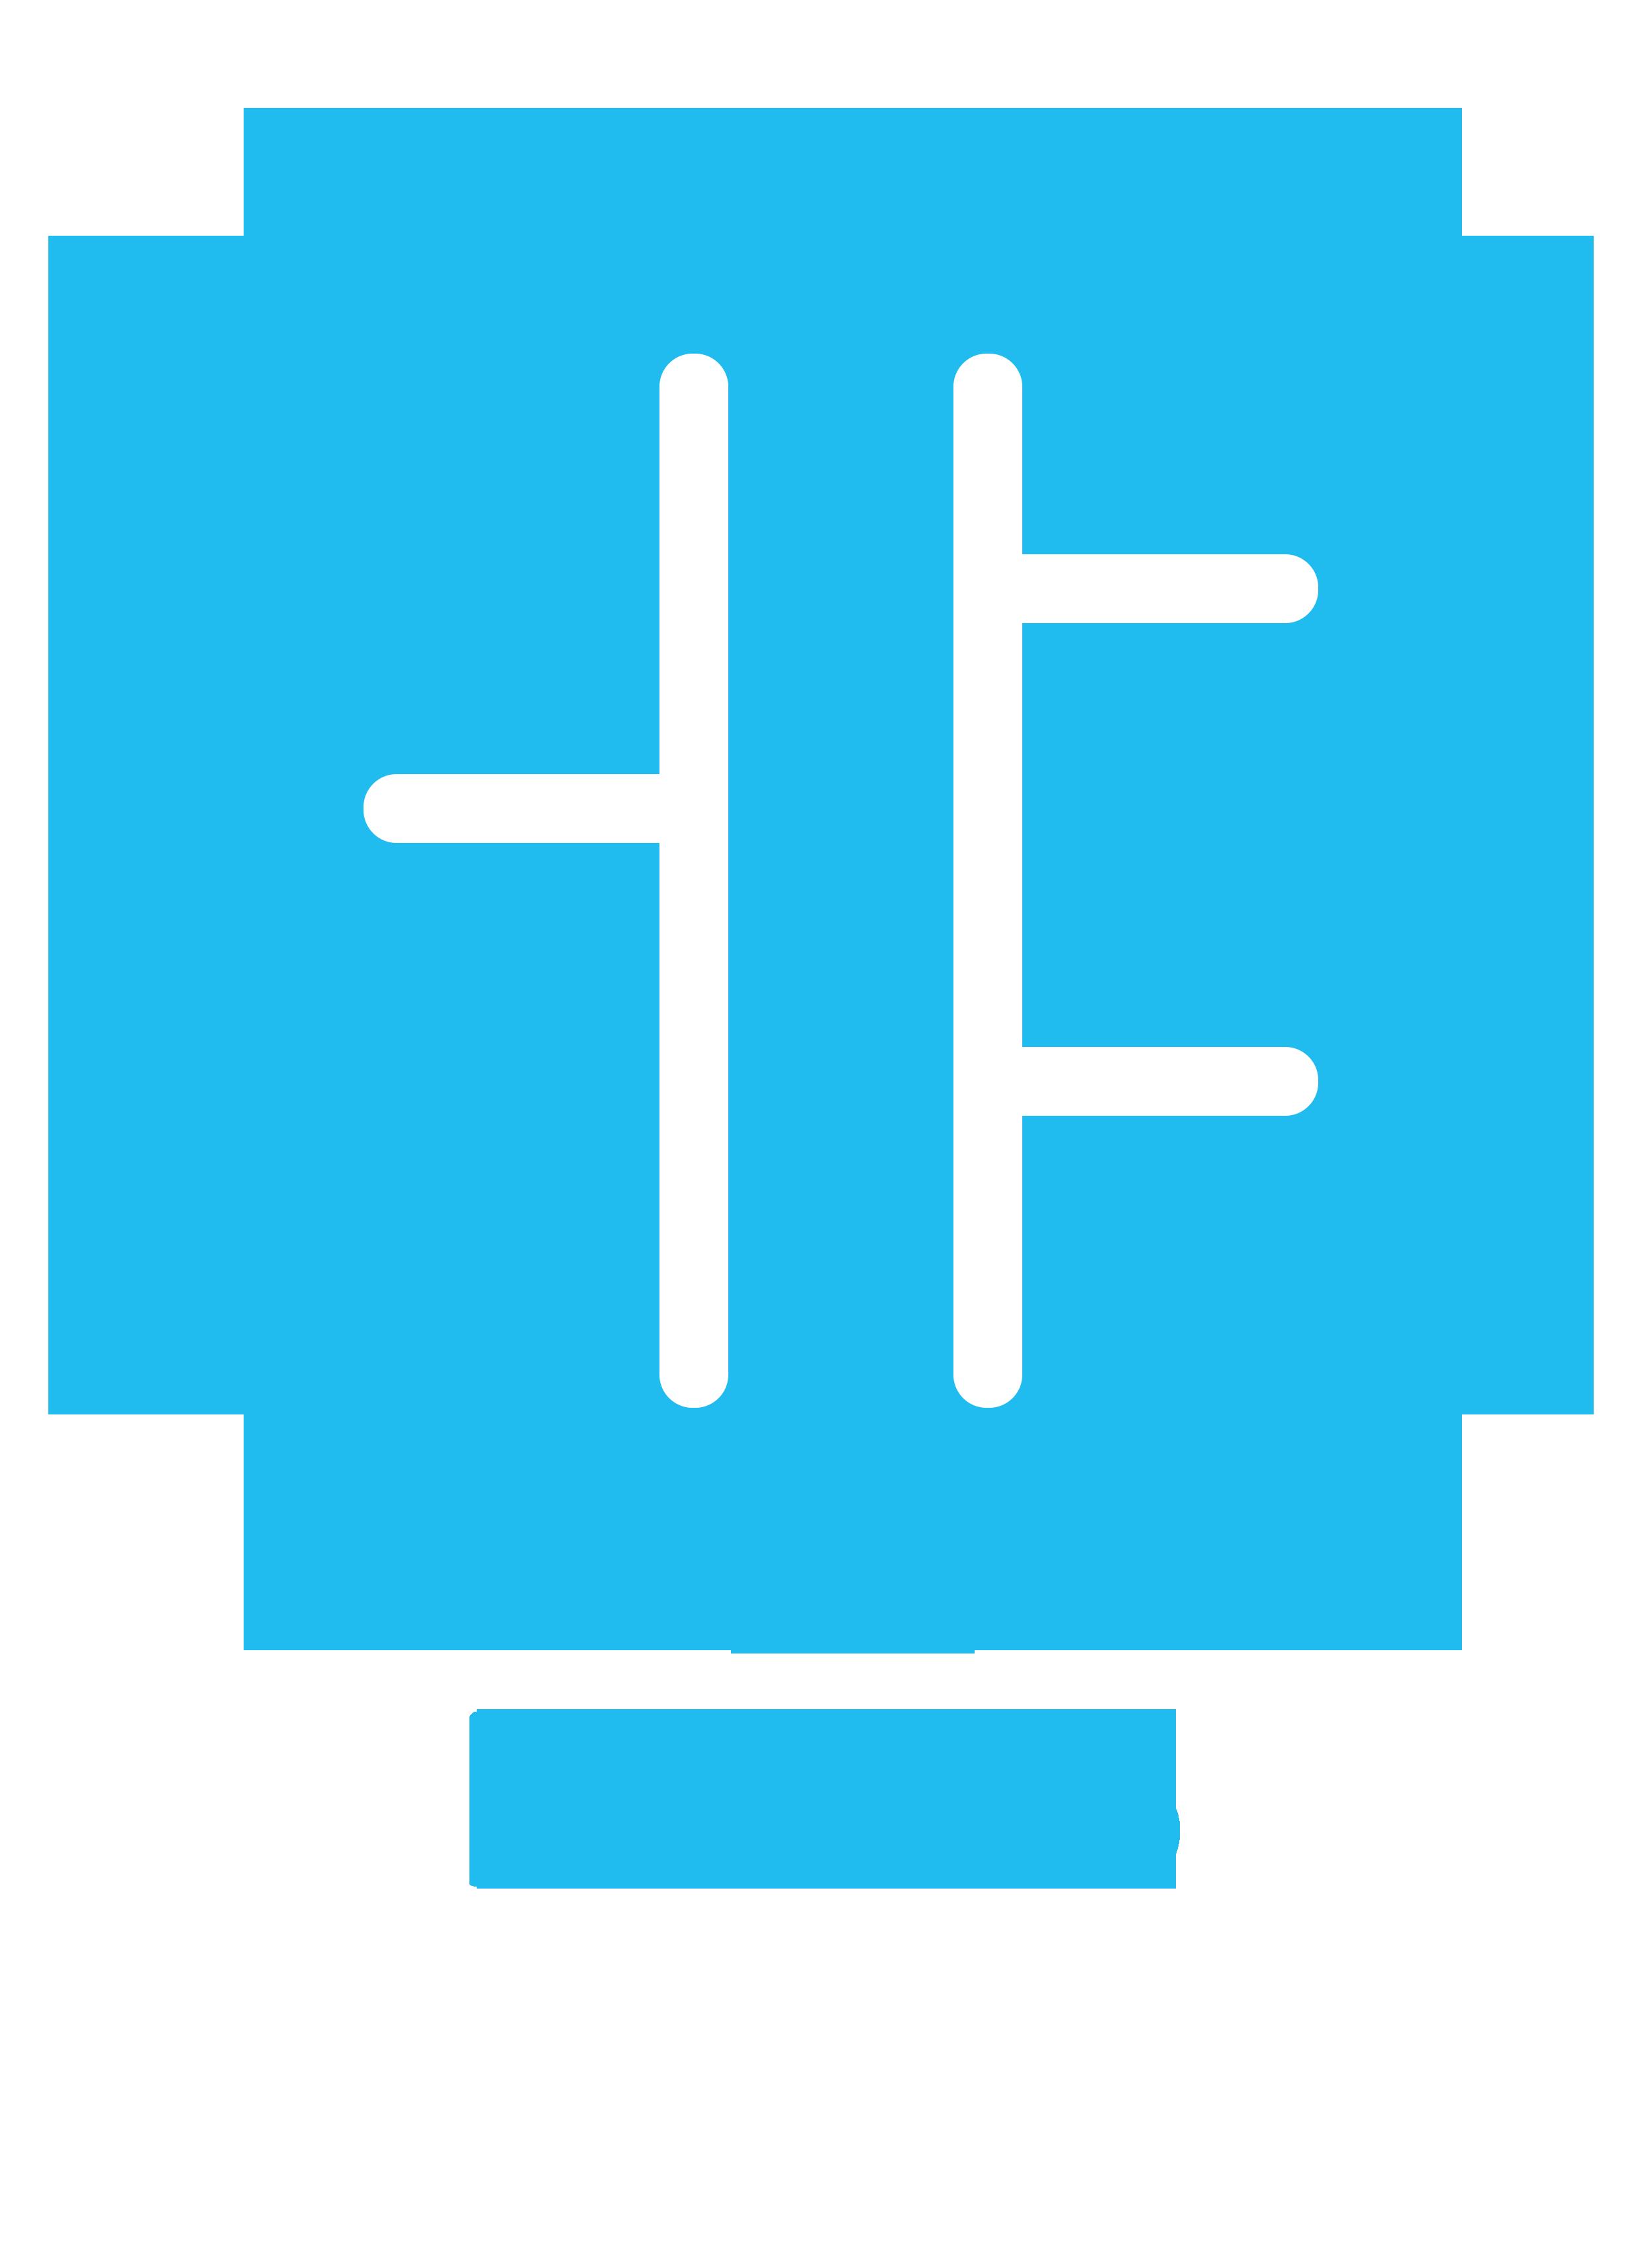 HWg Sensoren RS-485 | Slimme industriemonitoring | Product | MCS